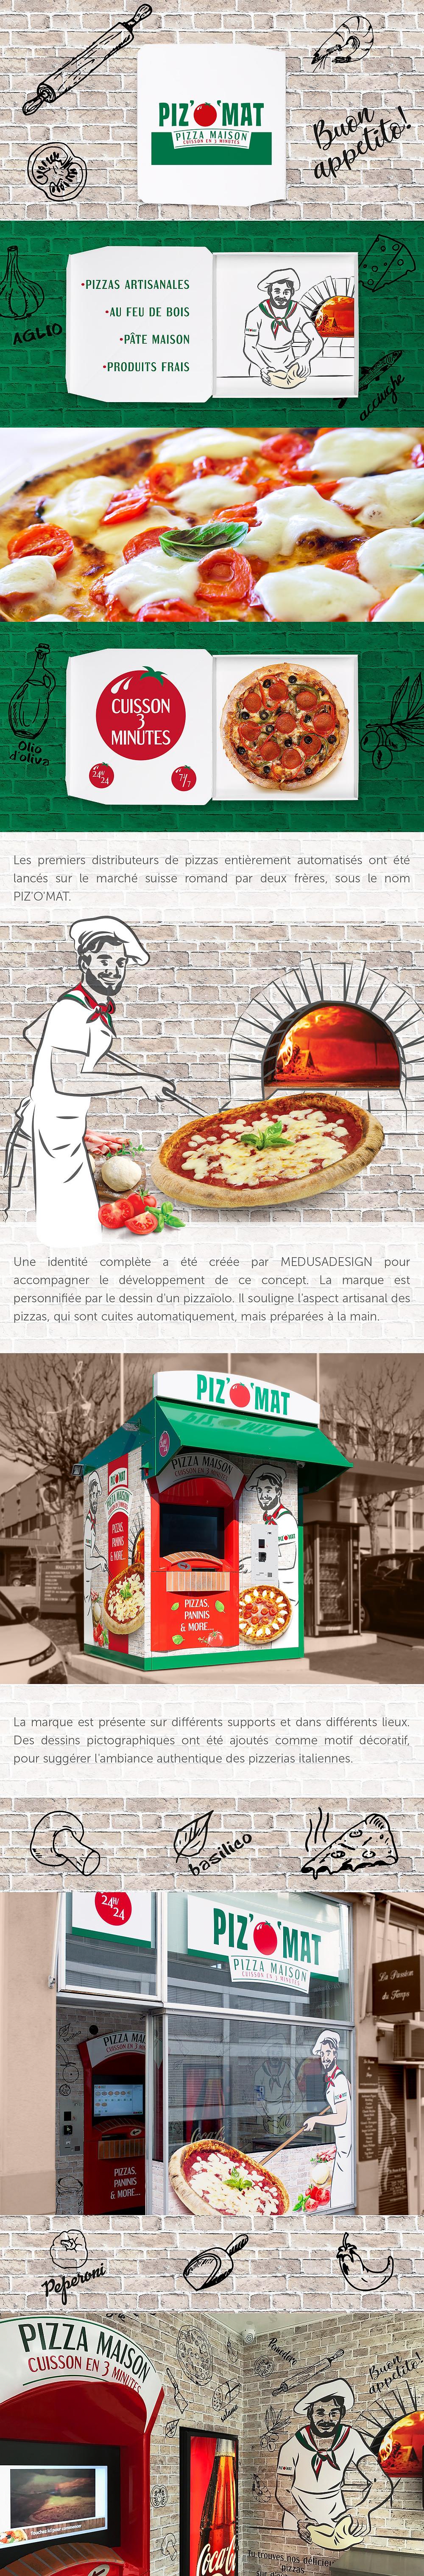 Pizomat